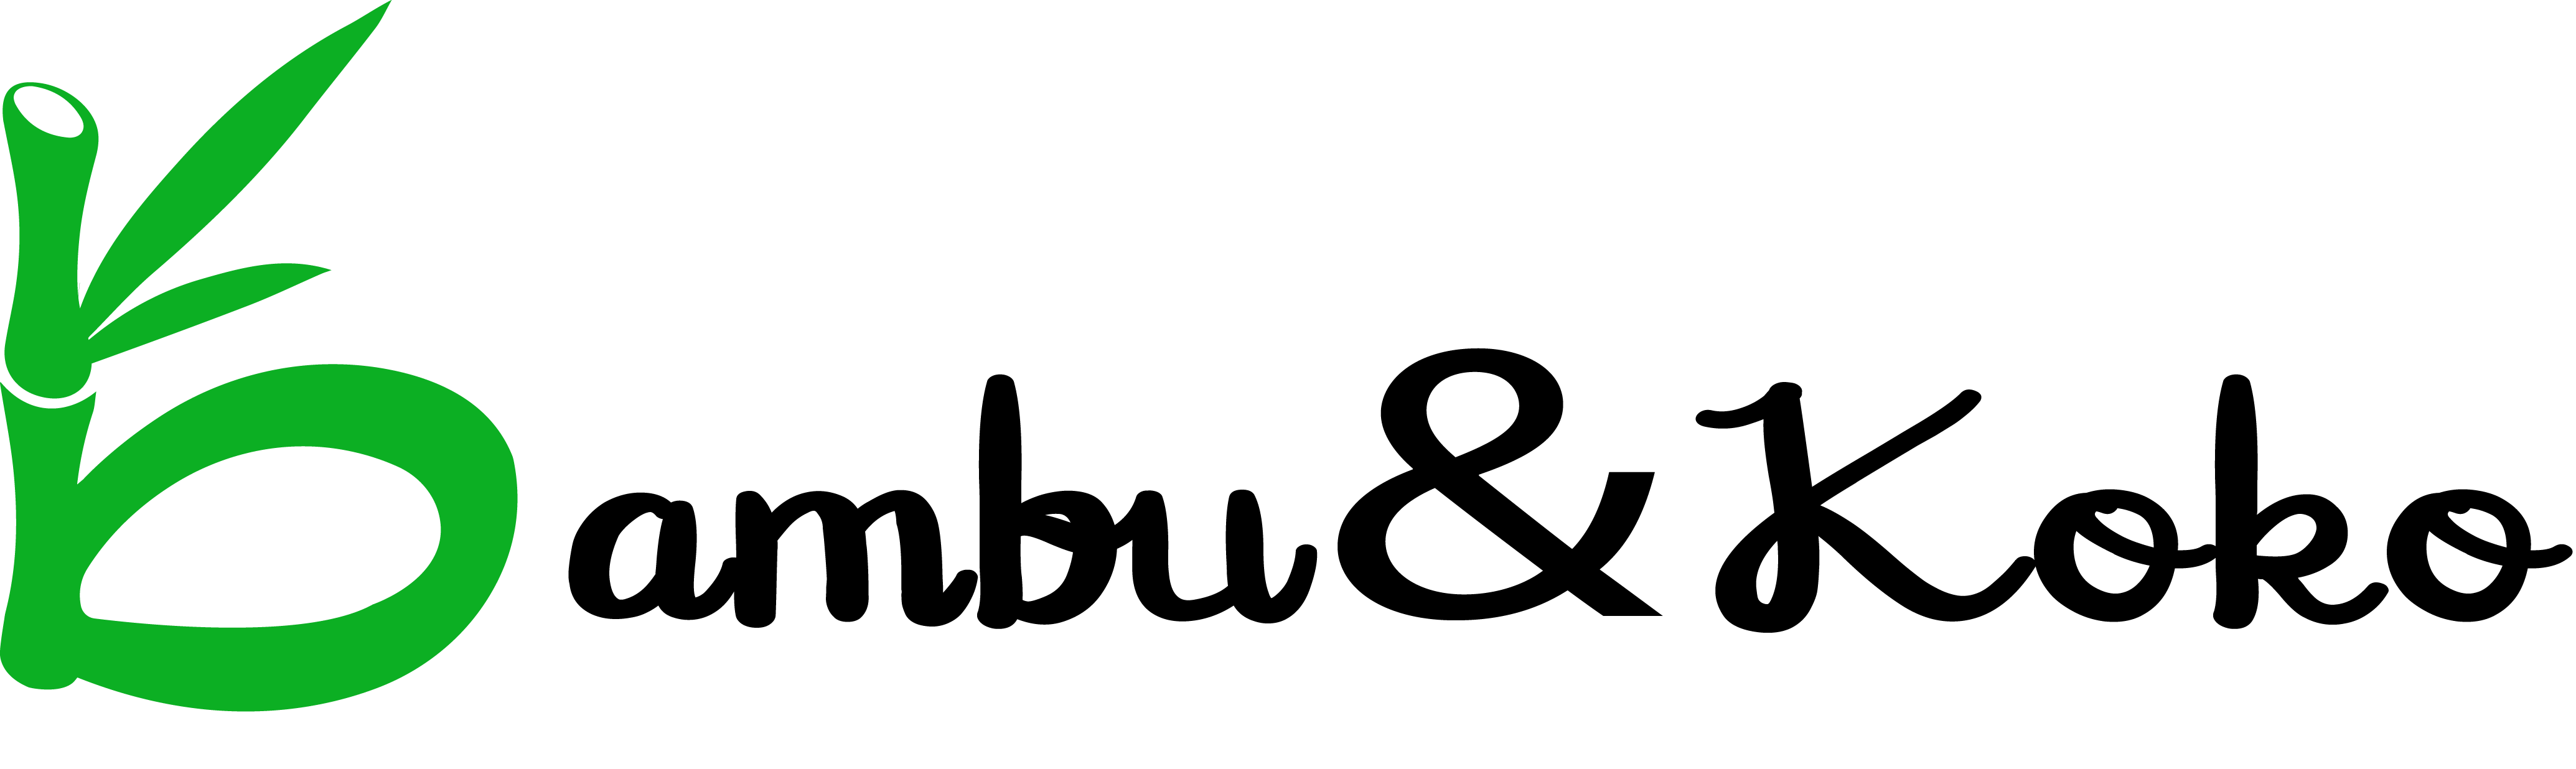 E-shop Bambukoko.com